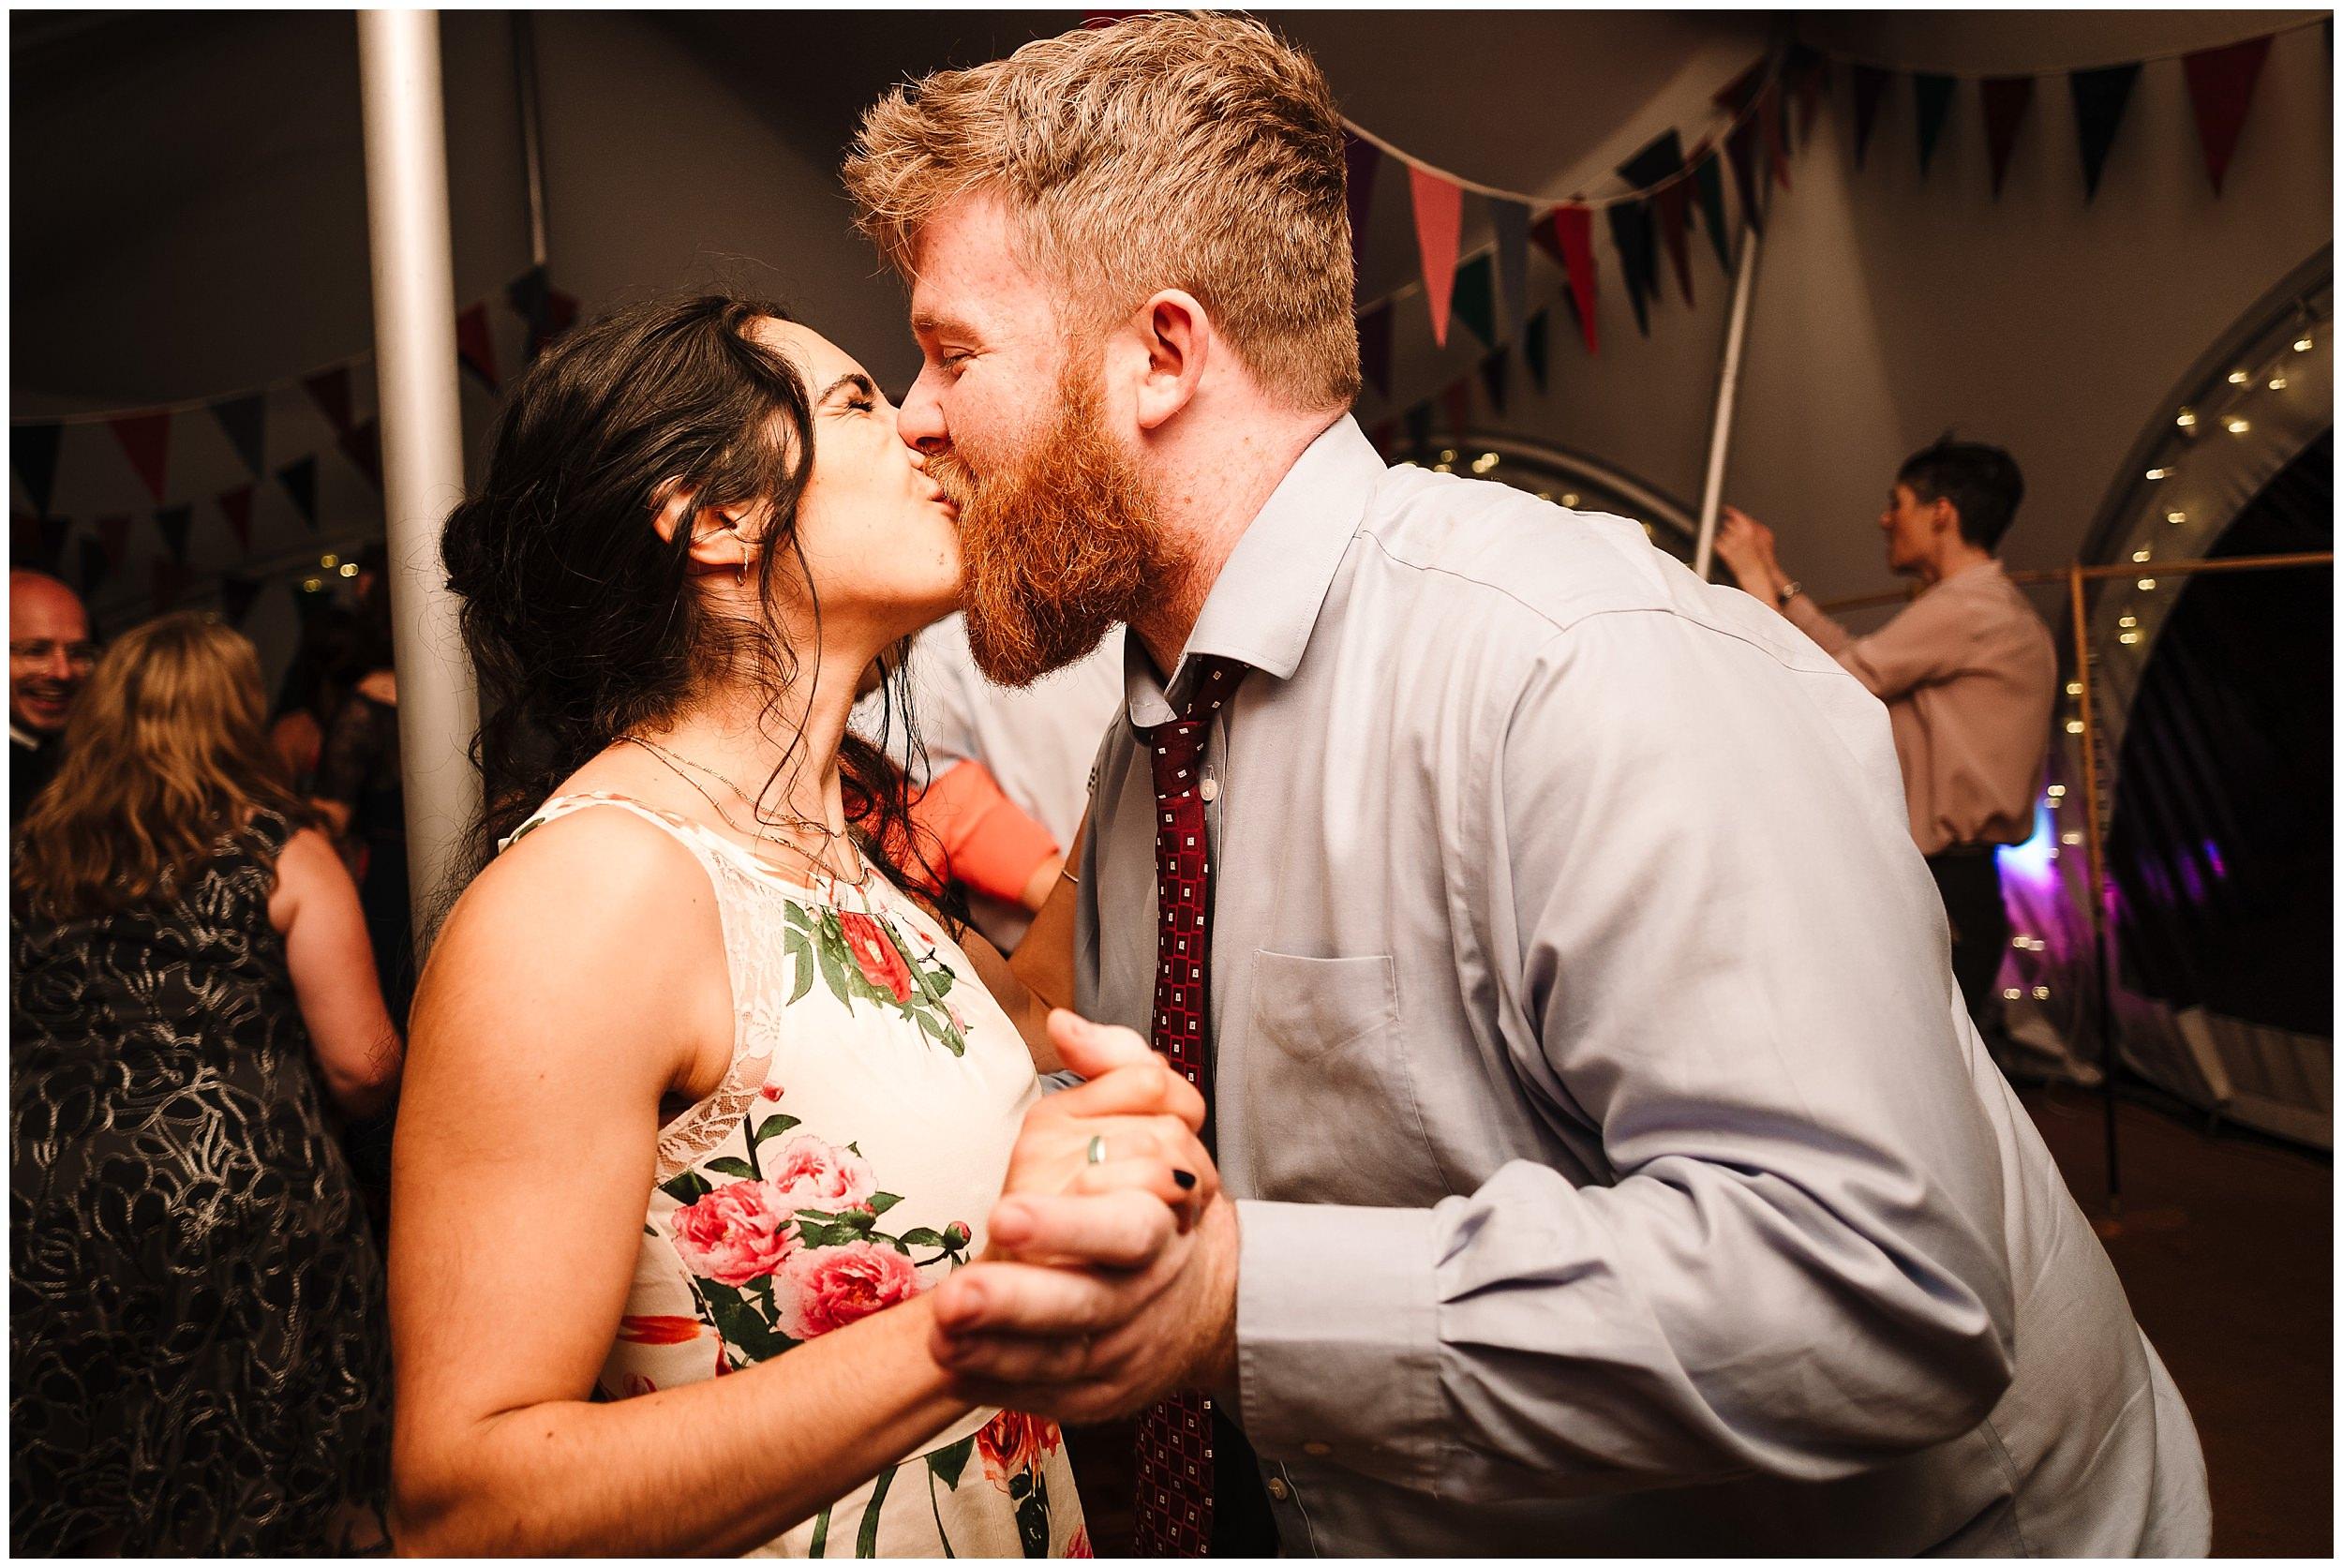 YORKSHIRE OUTDOOR WEDDING PHOTOGRAPHER LUCY ALEX_0048.jpg